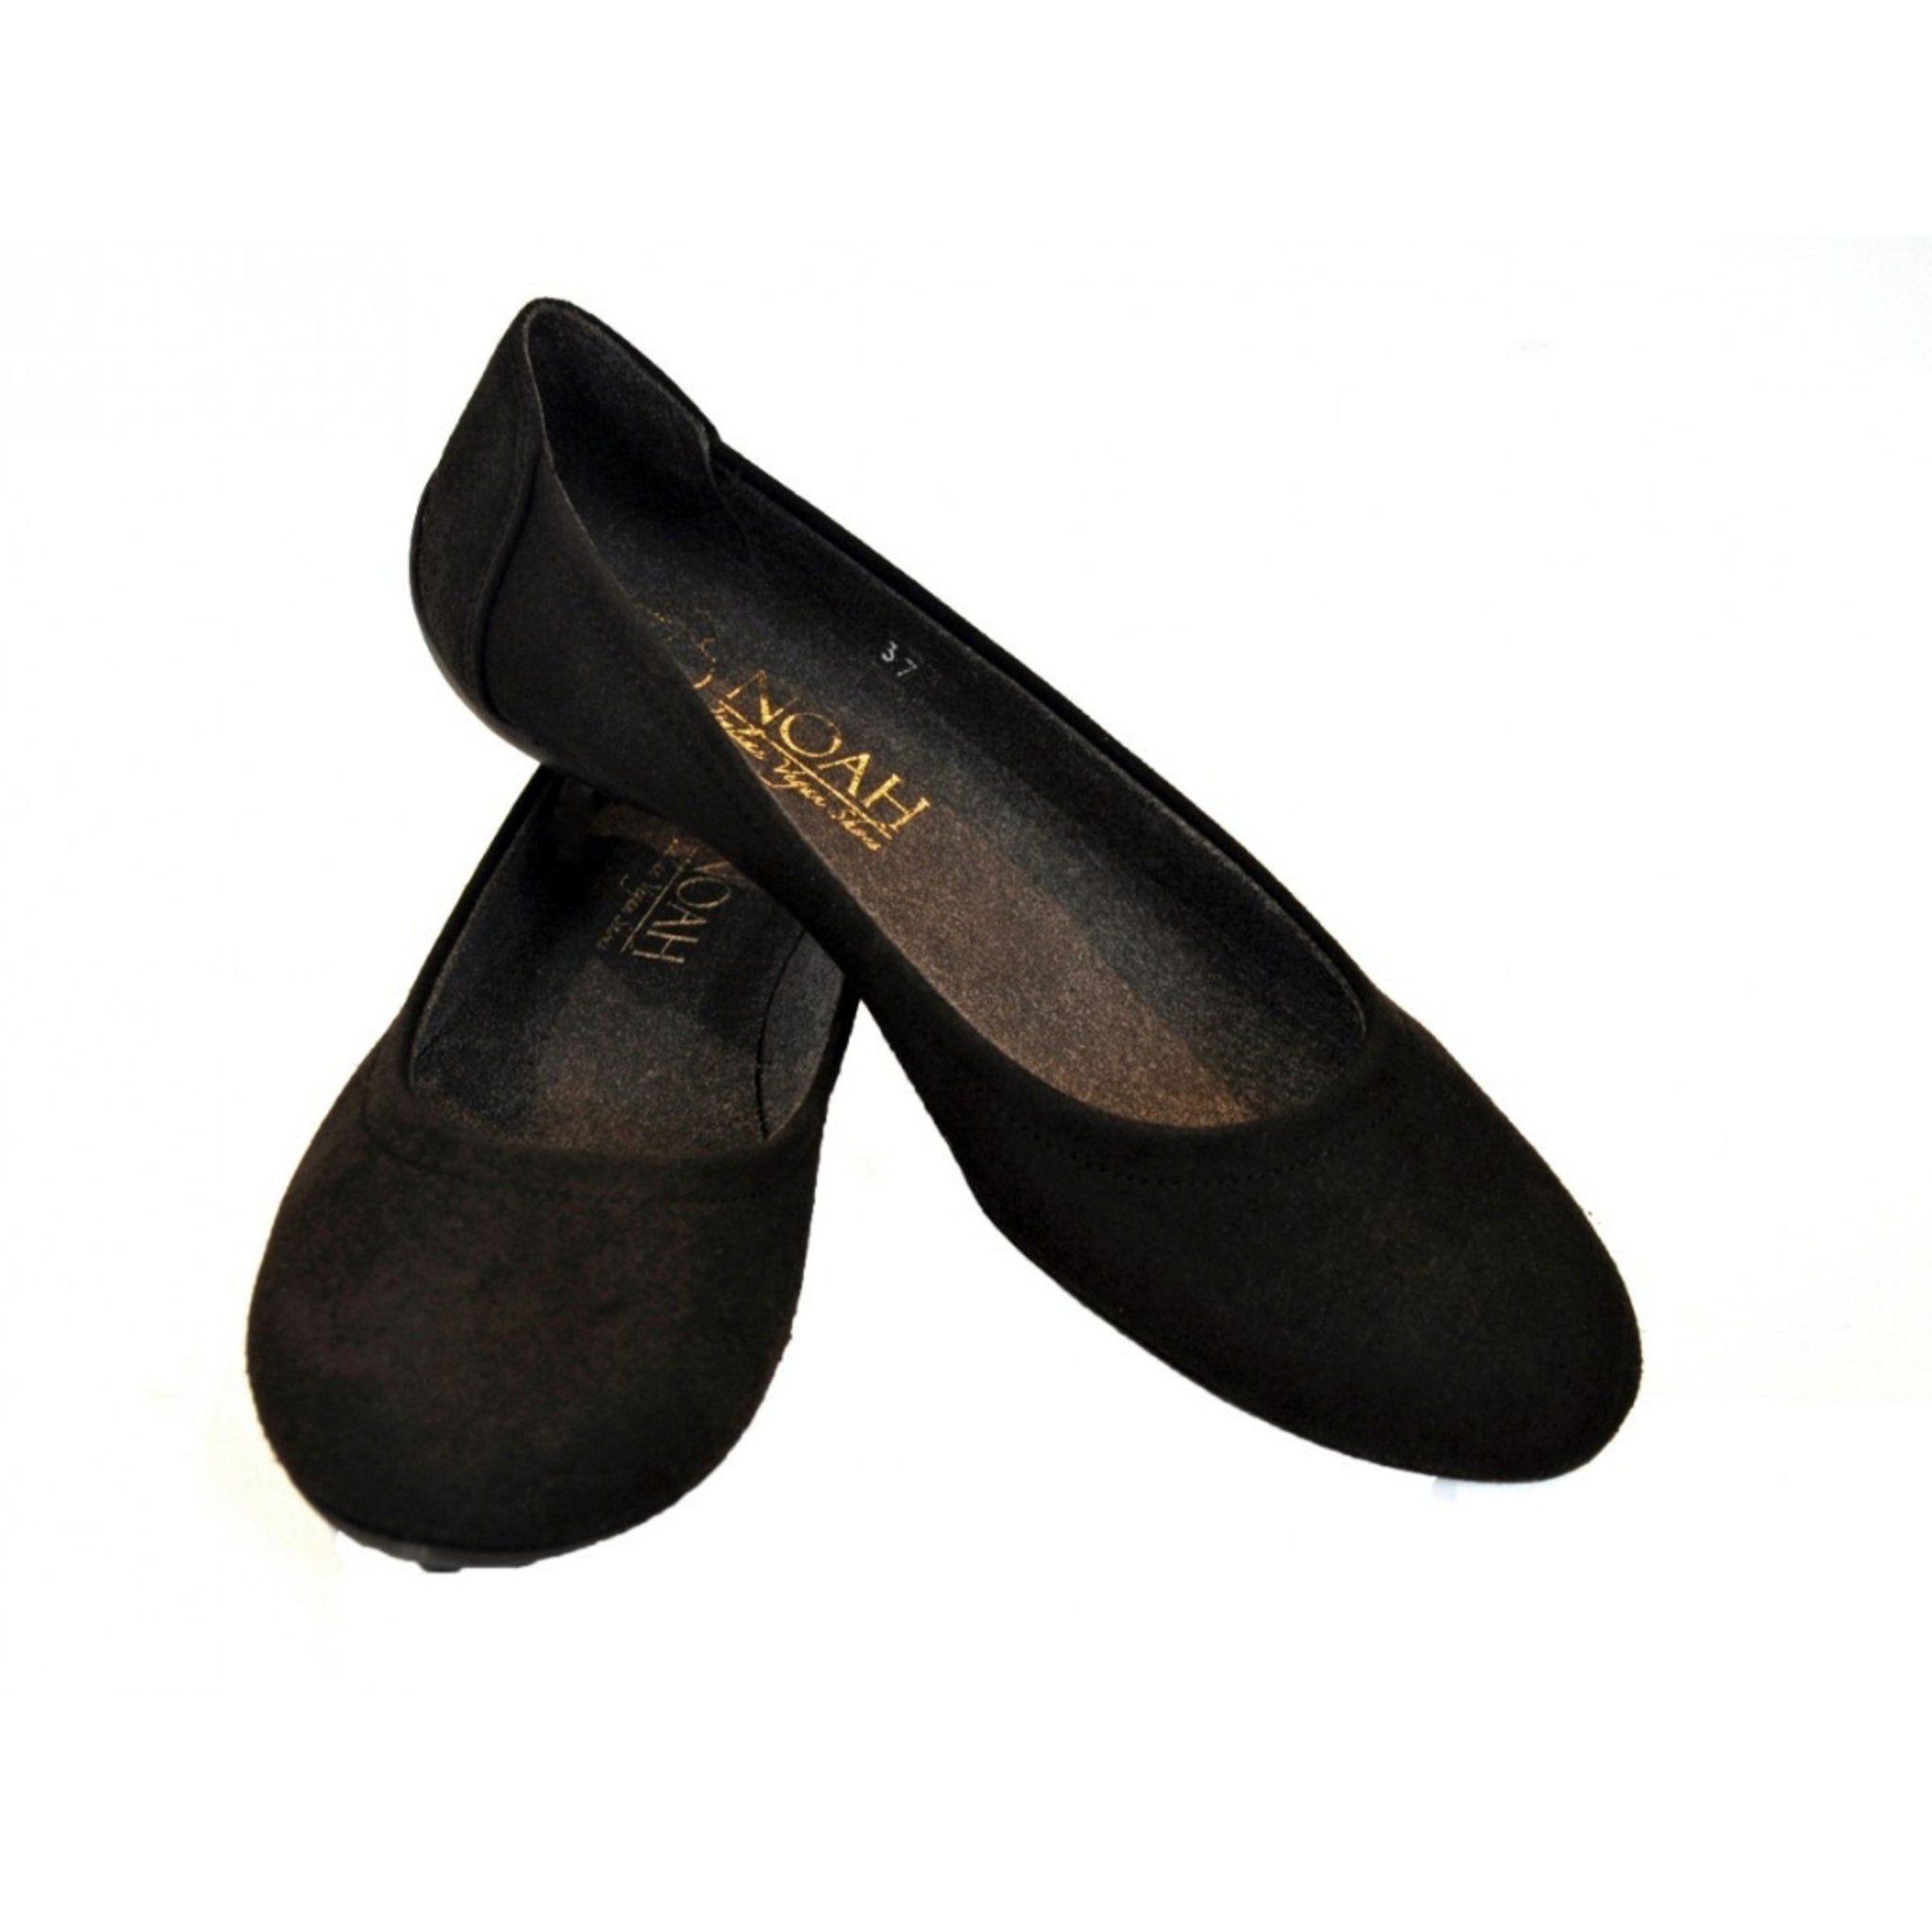 NOAH Italian Vegan Shoes Mia Ballet